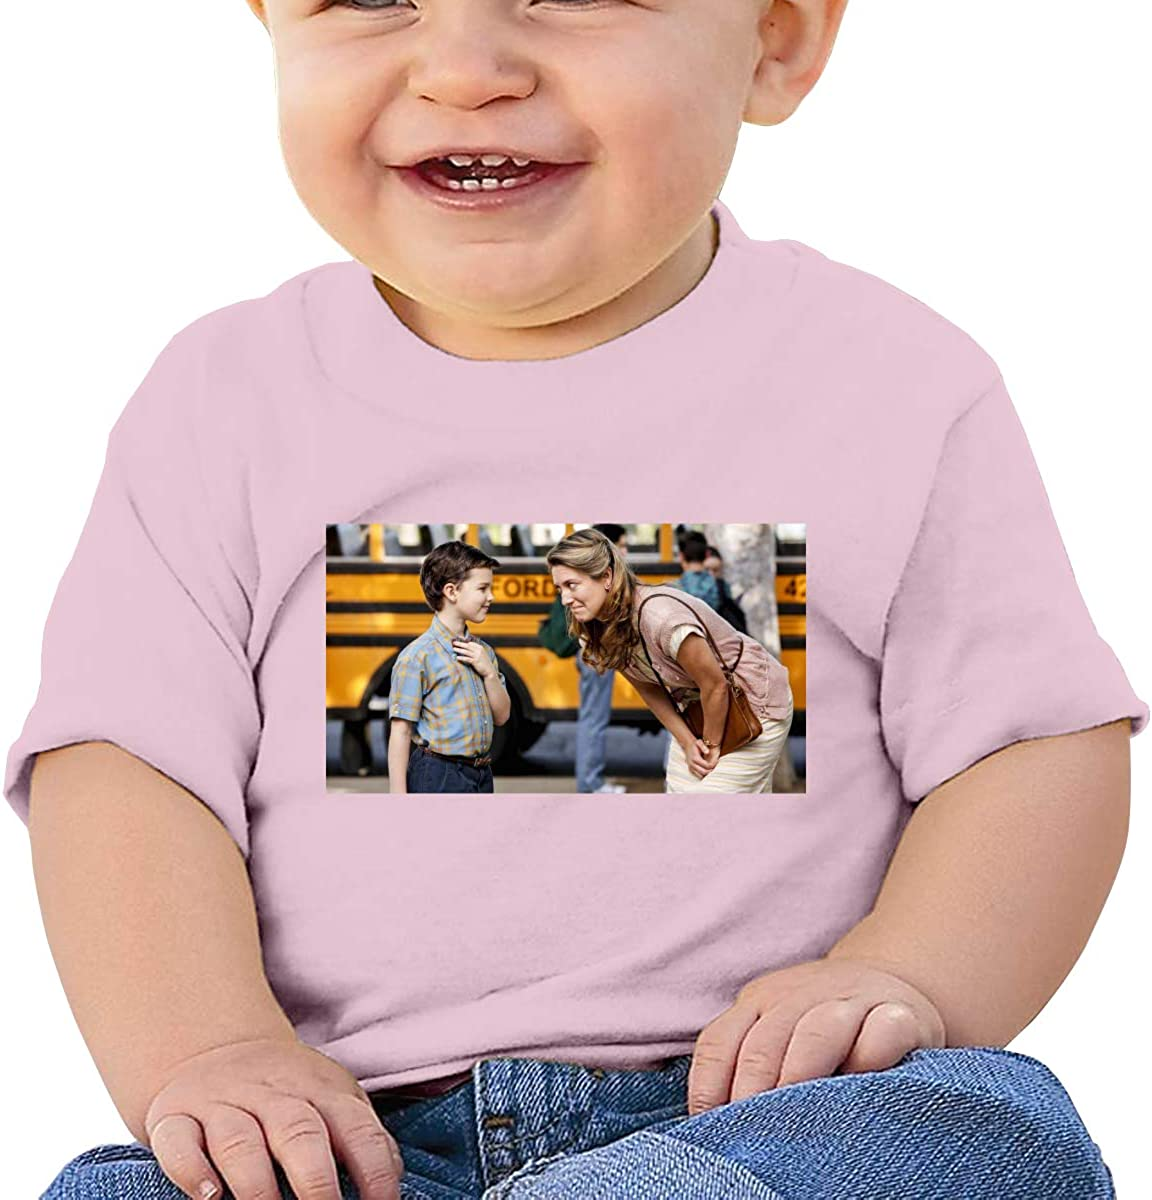 Honshang Young-Shel-Don Cute Black Tshirts for Baby Boy and Baby Girl Tee